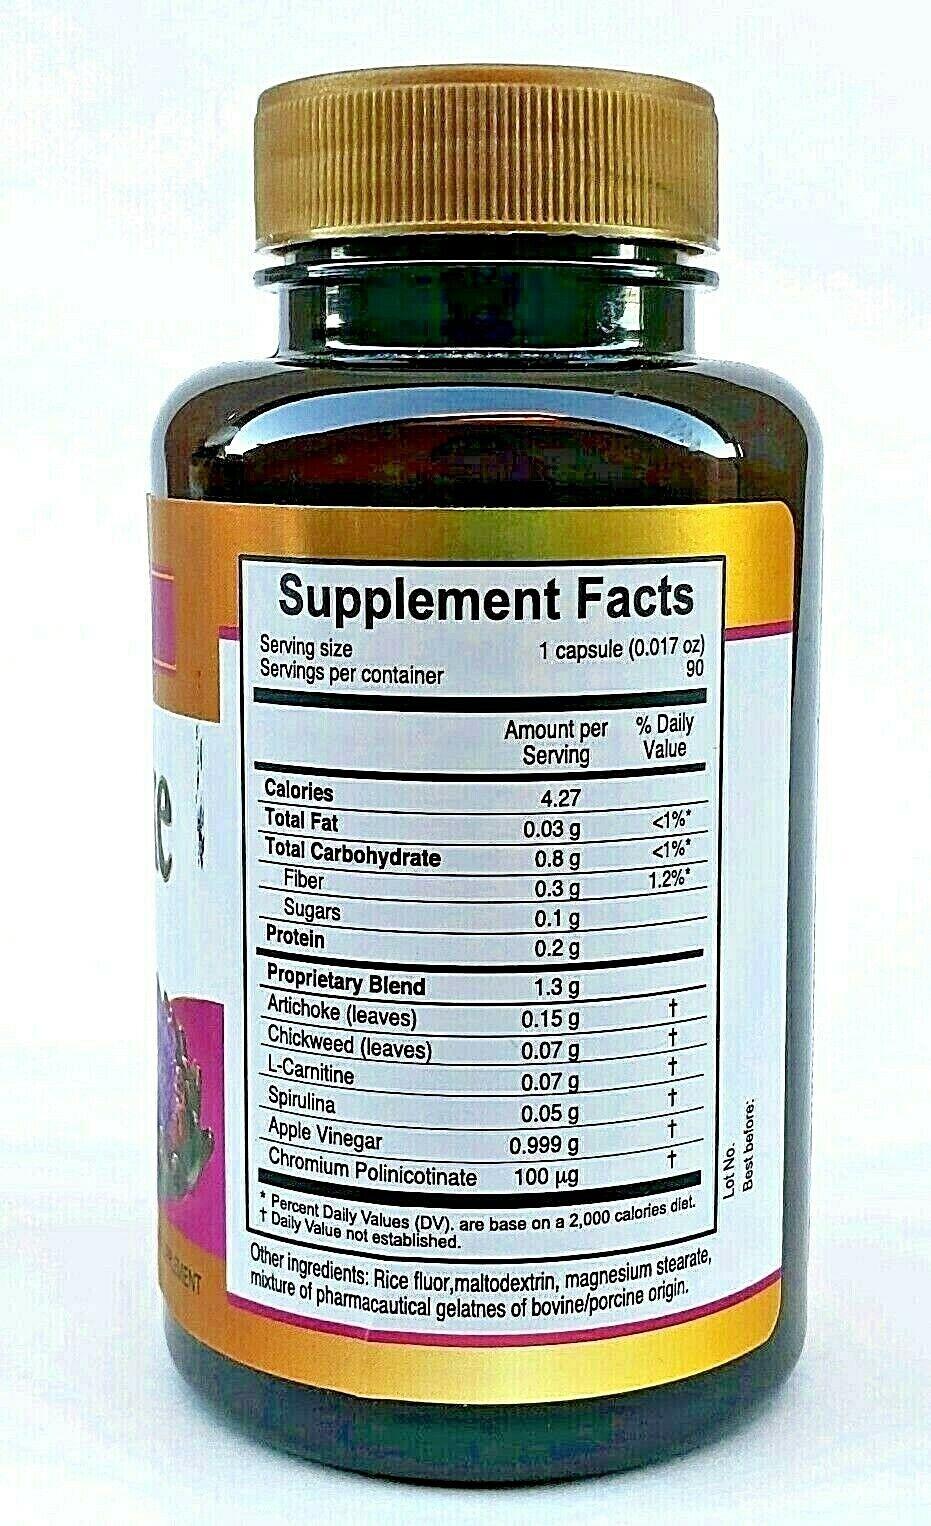 ARTICHOKE From Vida Herbal 90 Capsules 500 mg. Chickweed L-Carnitine Exp 12/2021 2